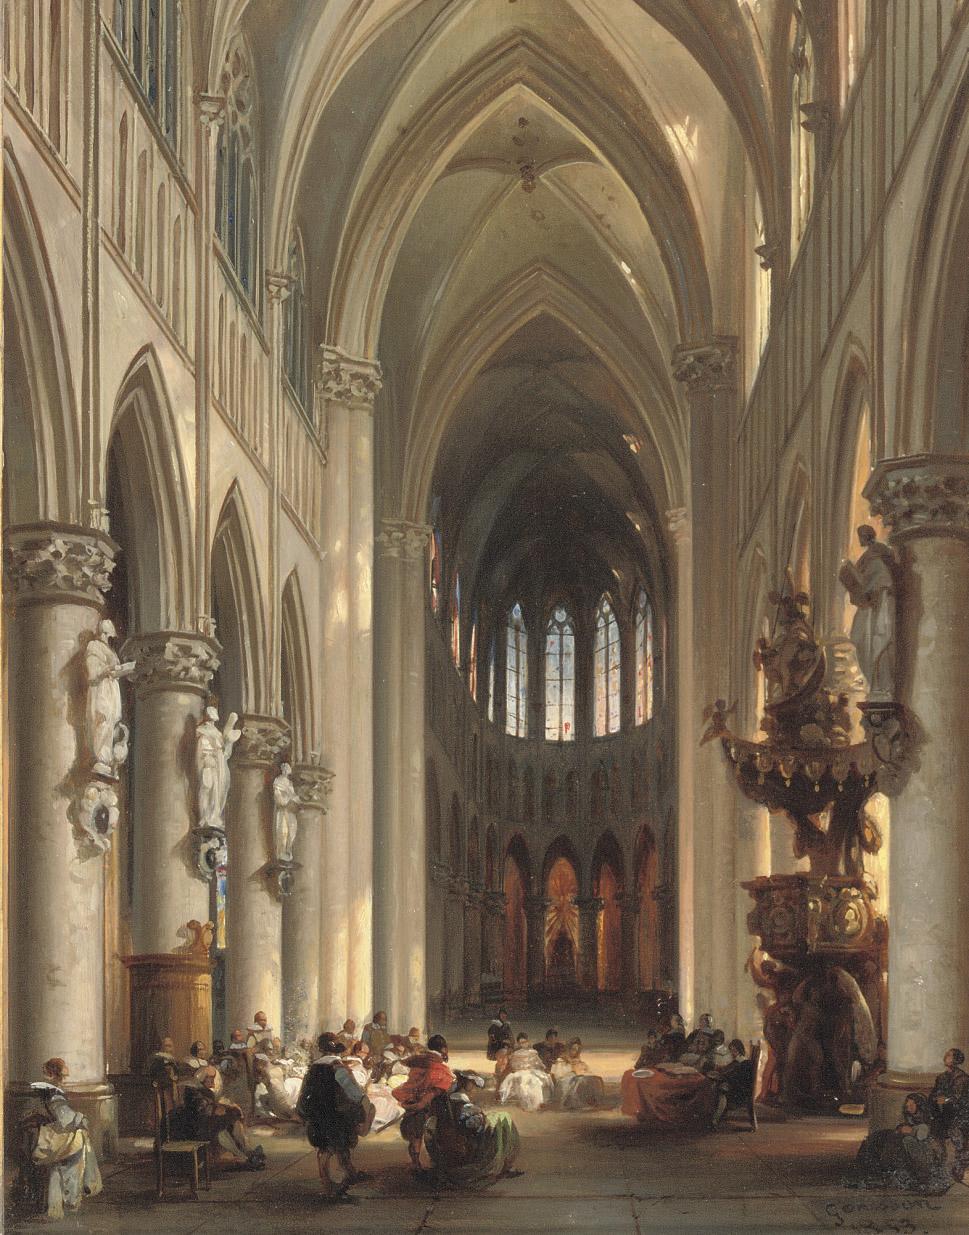 A gathering in a sunlit church